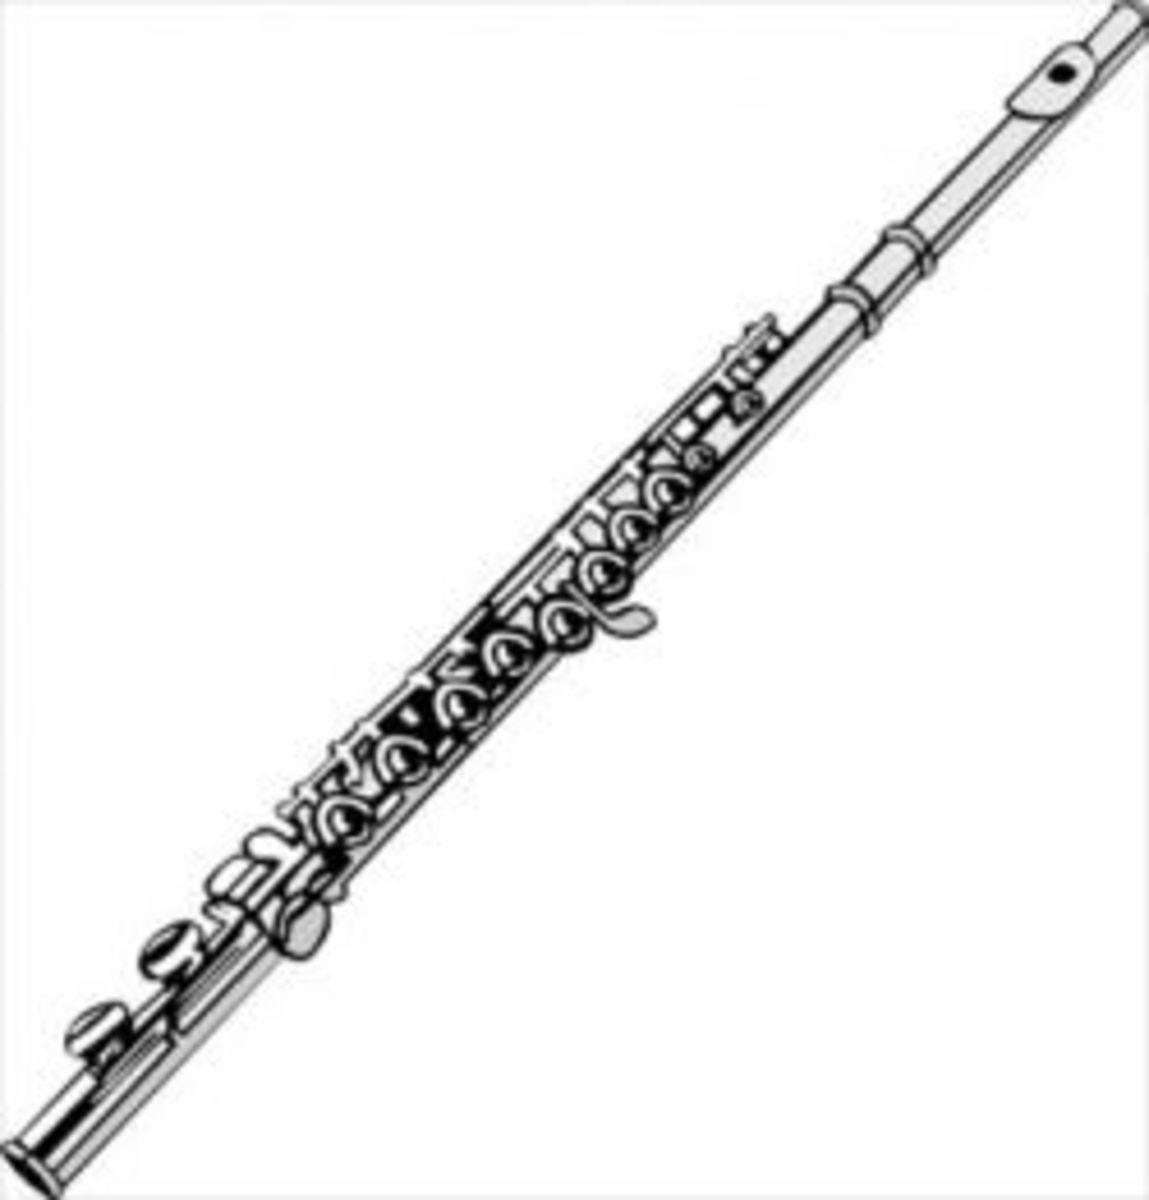 fluteplayer